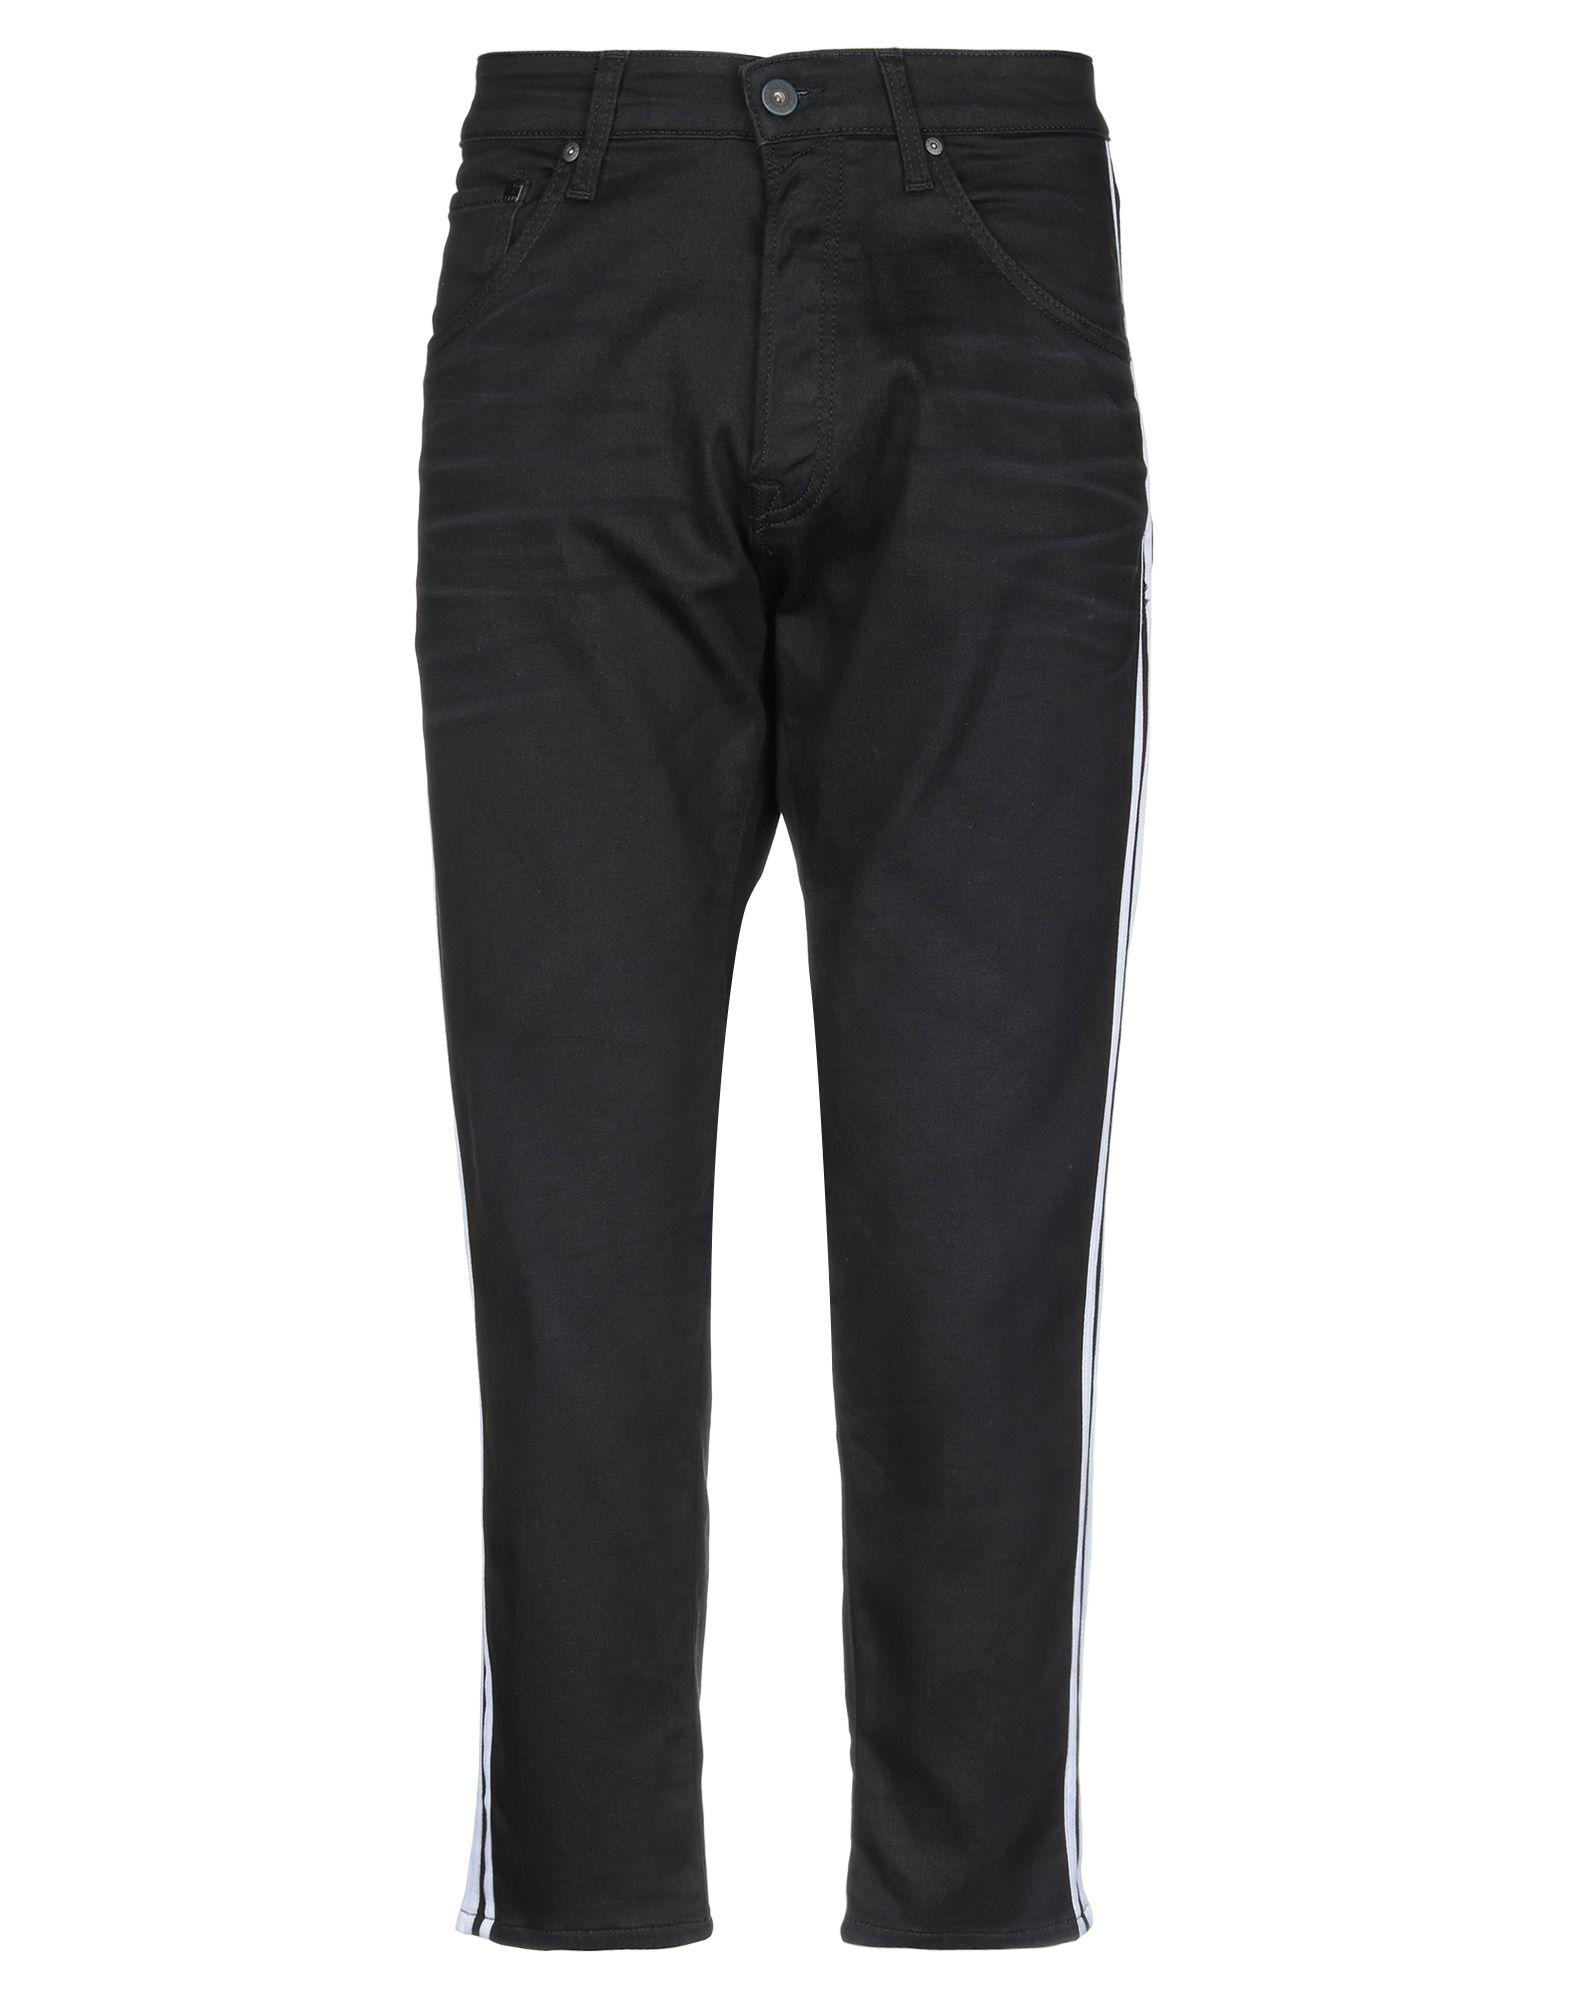 Pantaloni Pantaloni Jeans Jack & Jones uomo - 42754137KG  bis zu 70% sparen